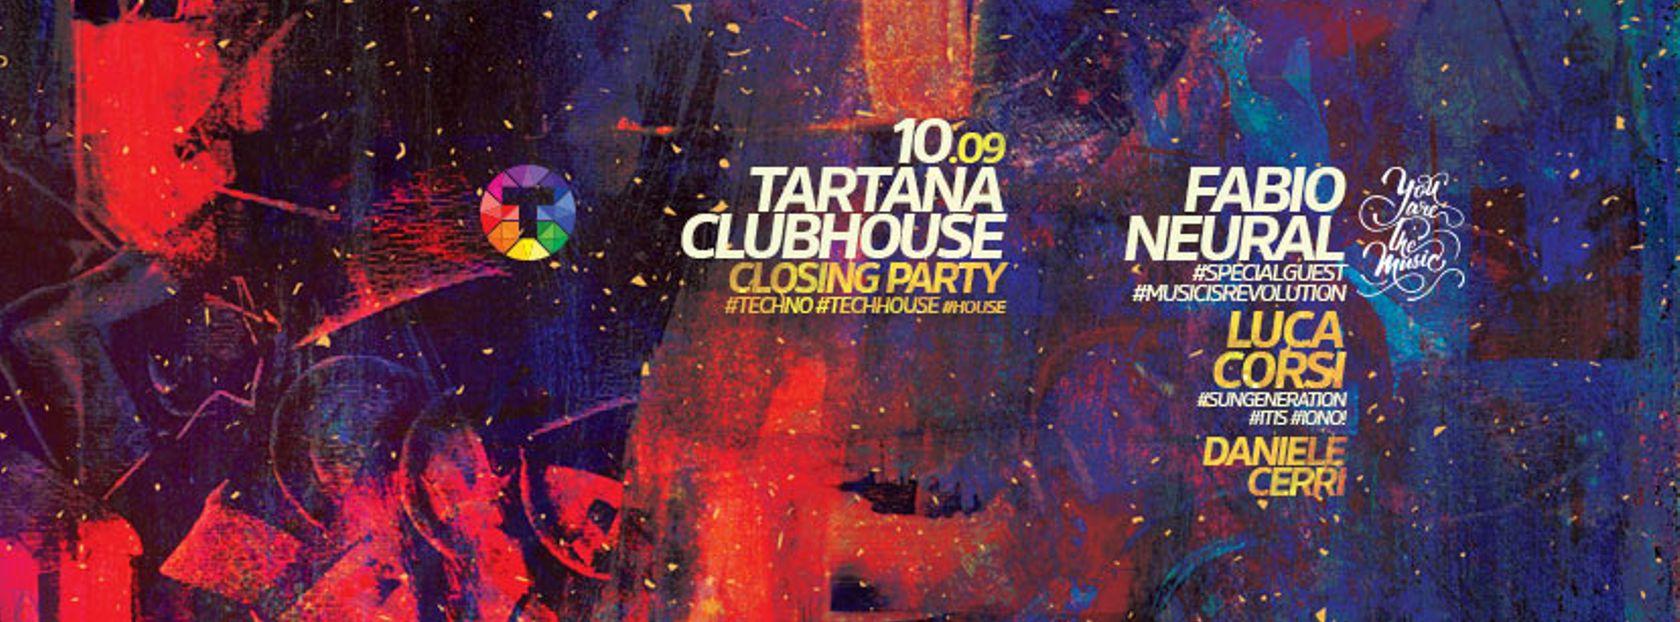 - 10.09 CLUBHOUSE CLOSING PARTY Fabio Neural, Luca Corsi, Daniele Cerri #techno #techhouse